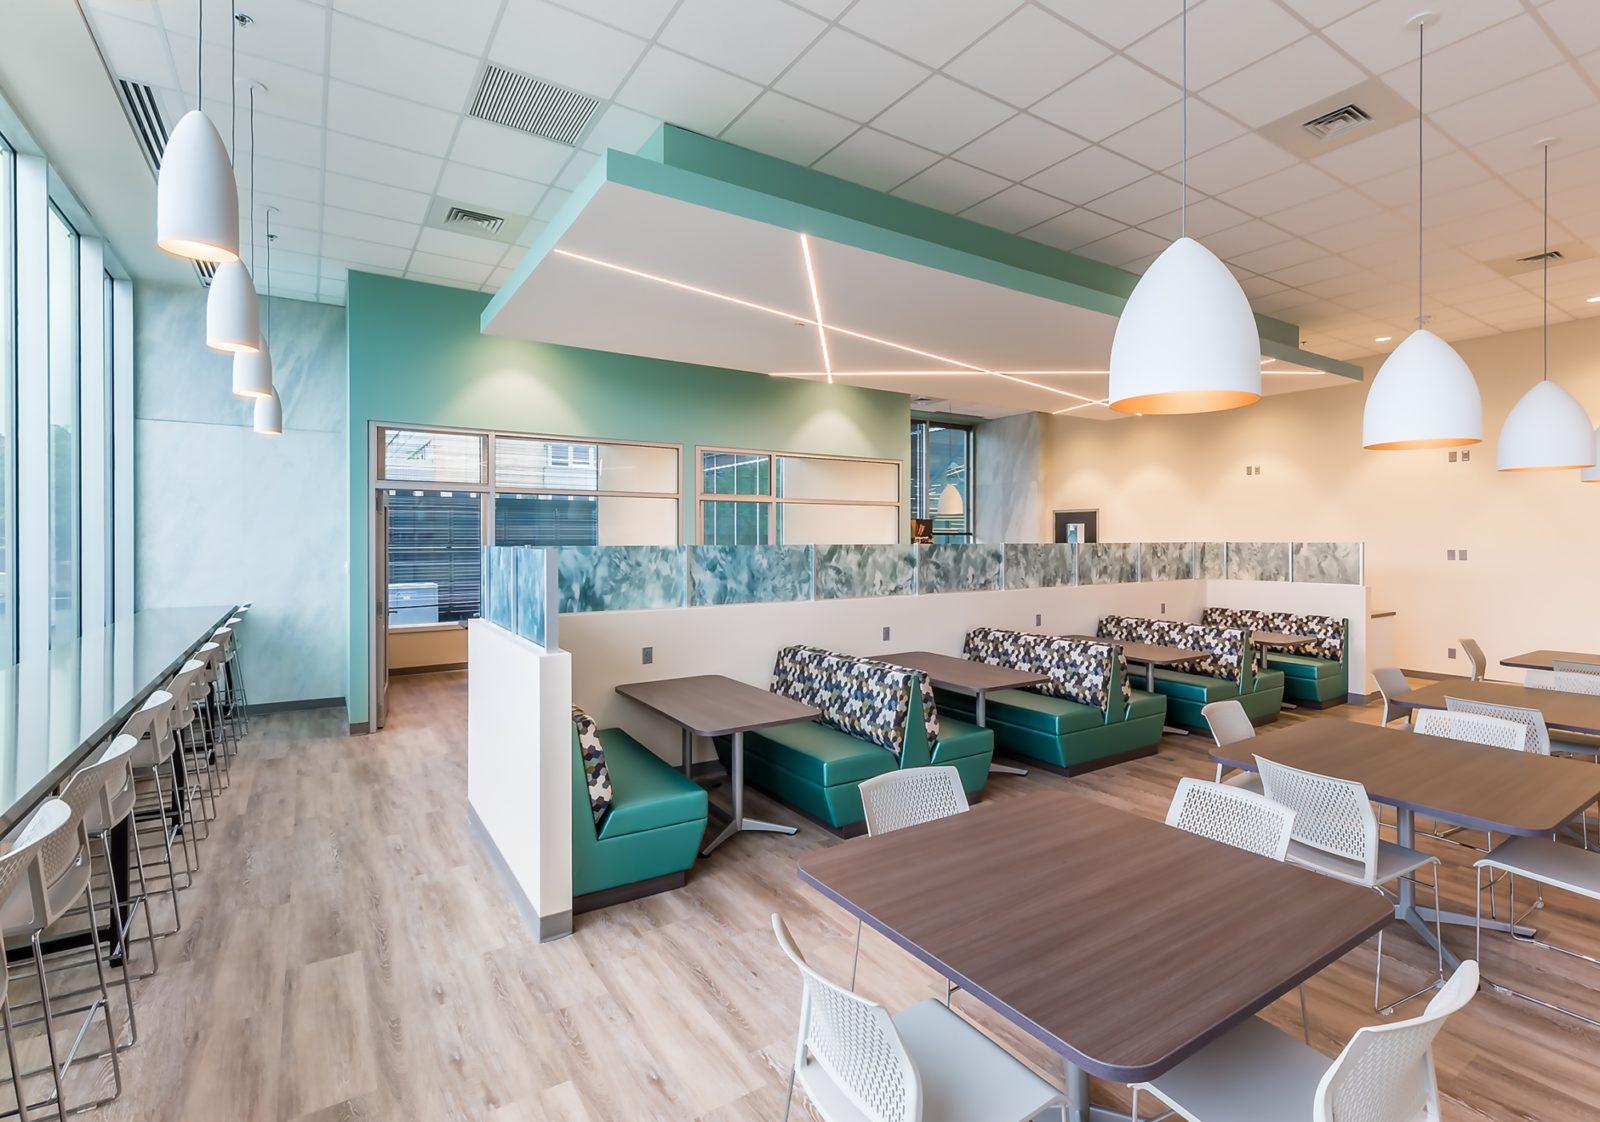 Meritrust Cafe Potential Primary